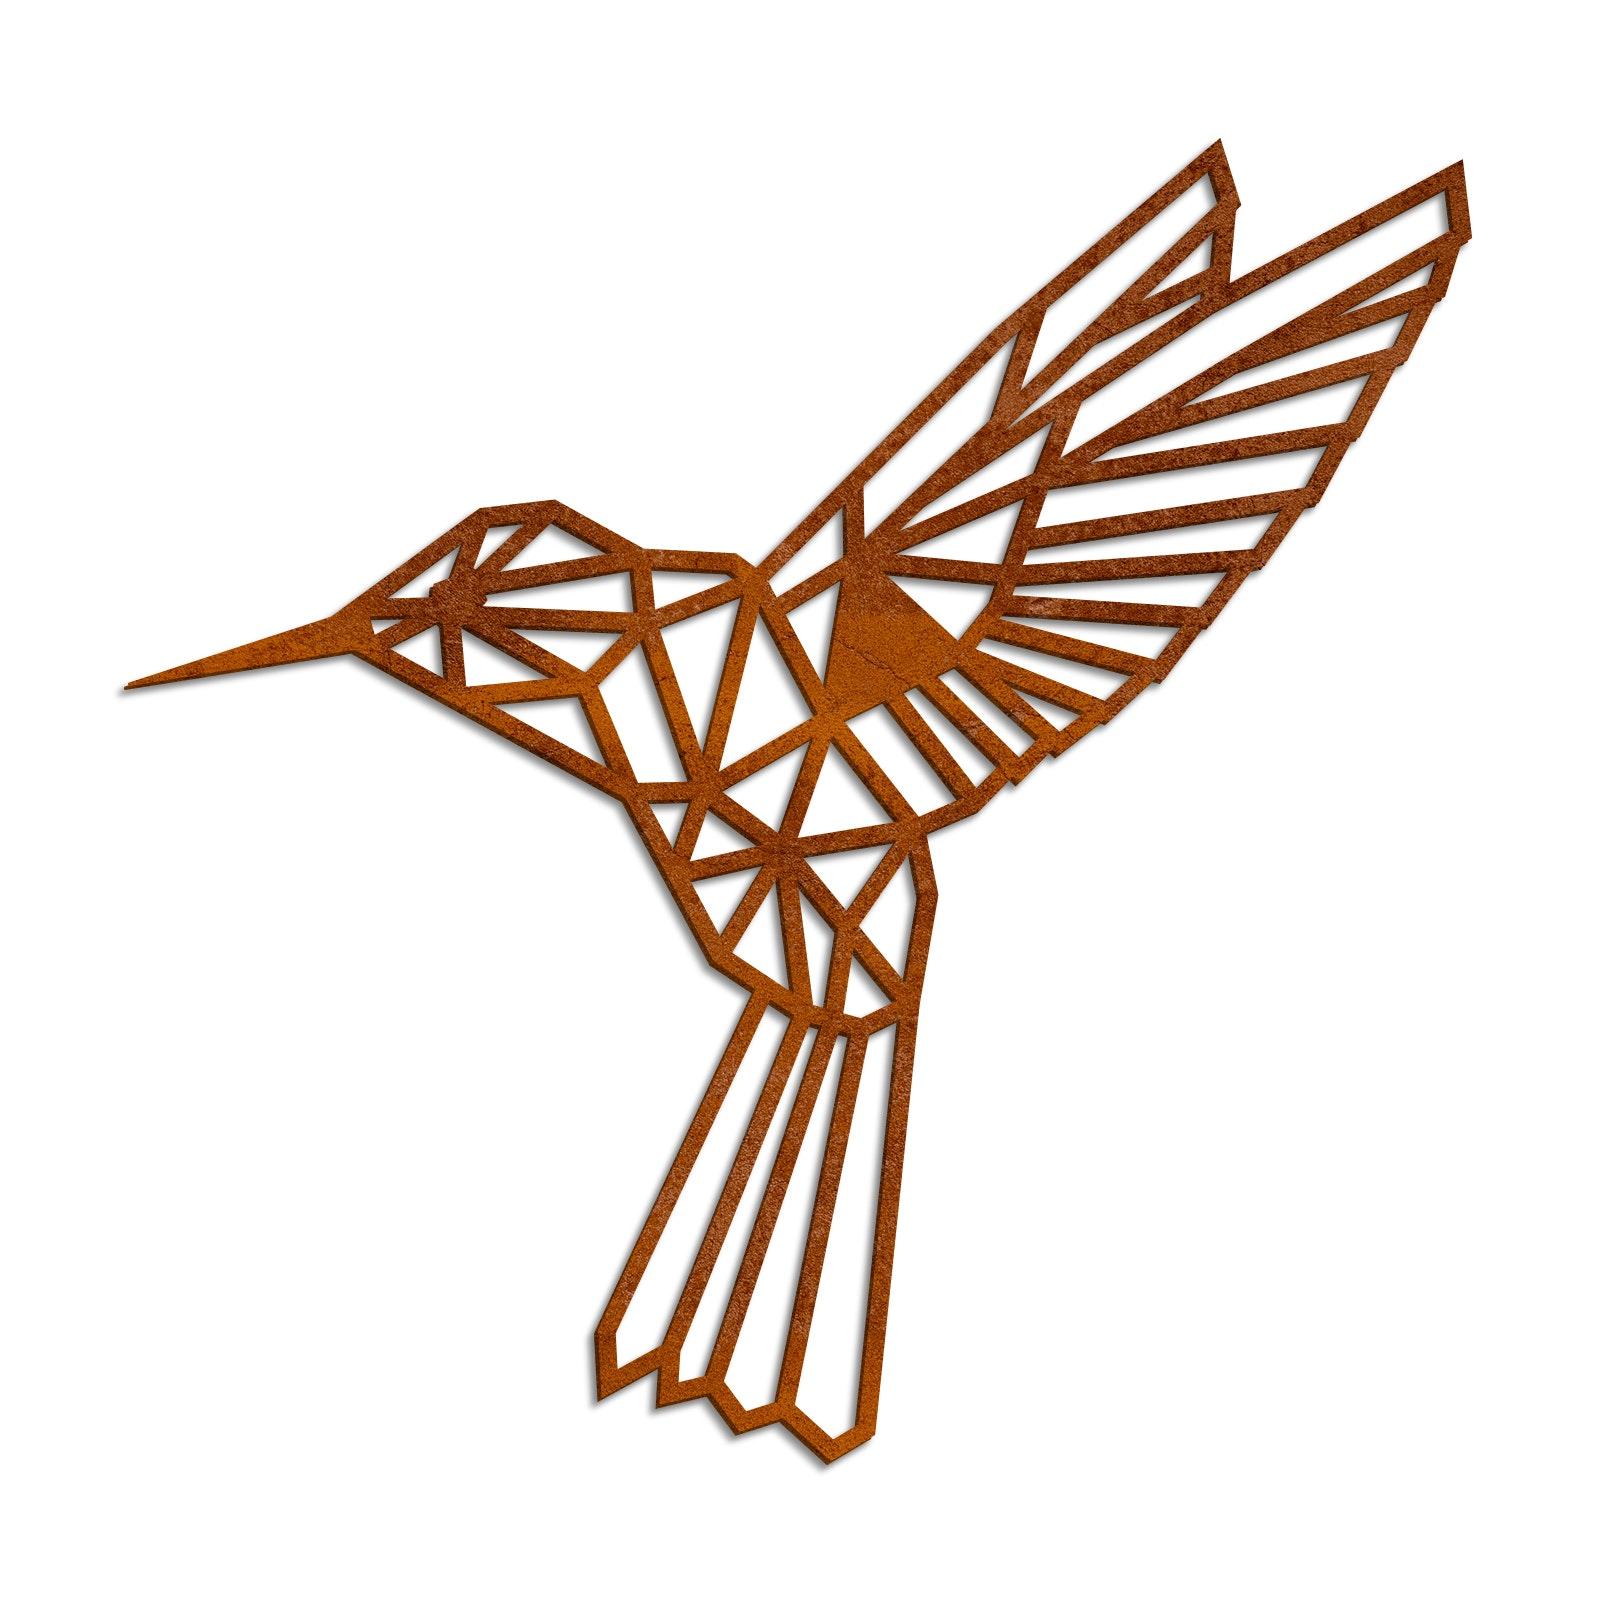 Geometrischer Kolibri L in Edelrost-Optik